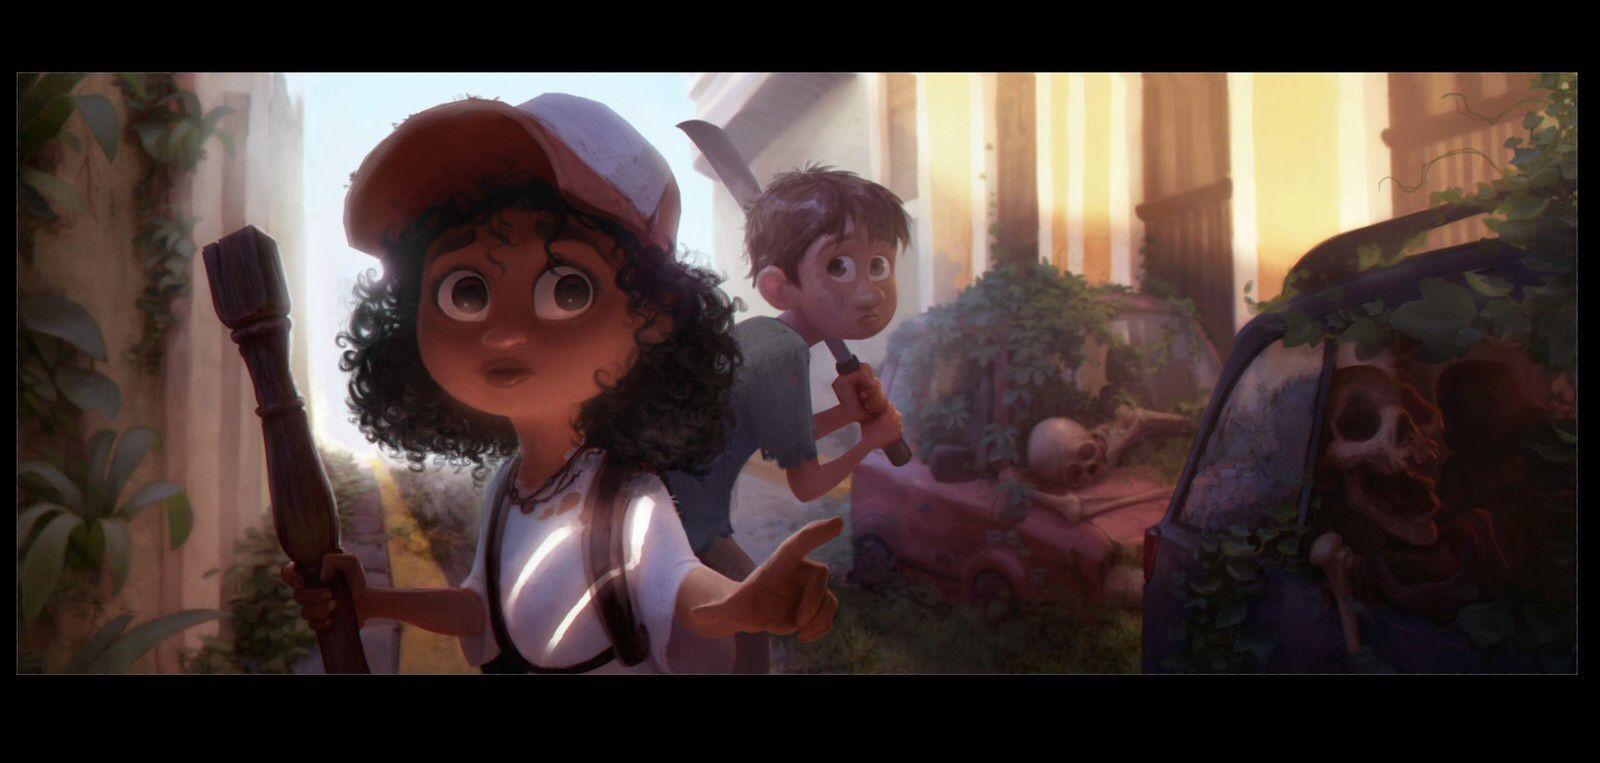 Jake Panian Animation design, Painting, Illustration